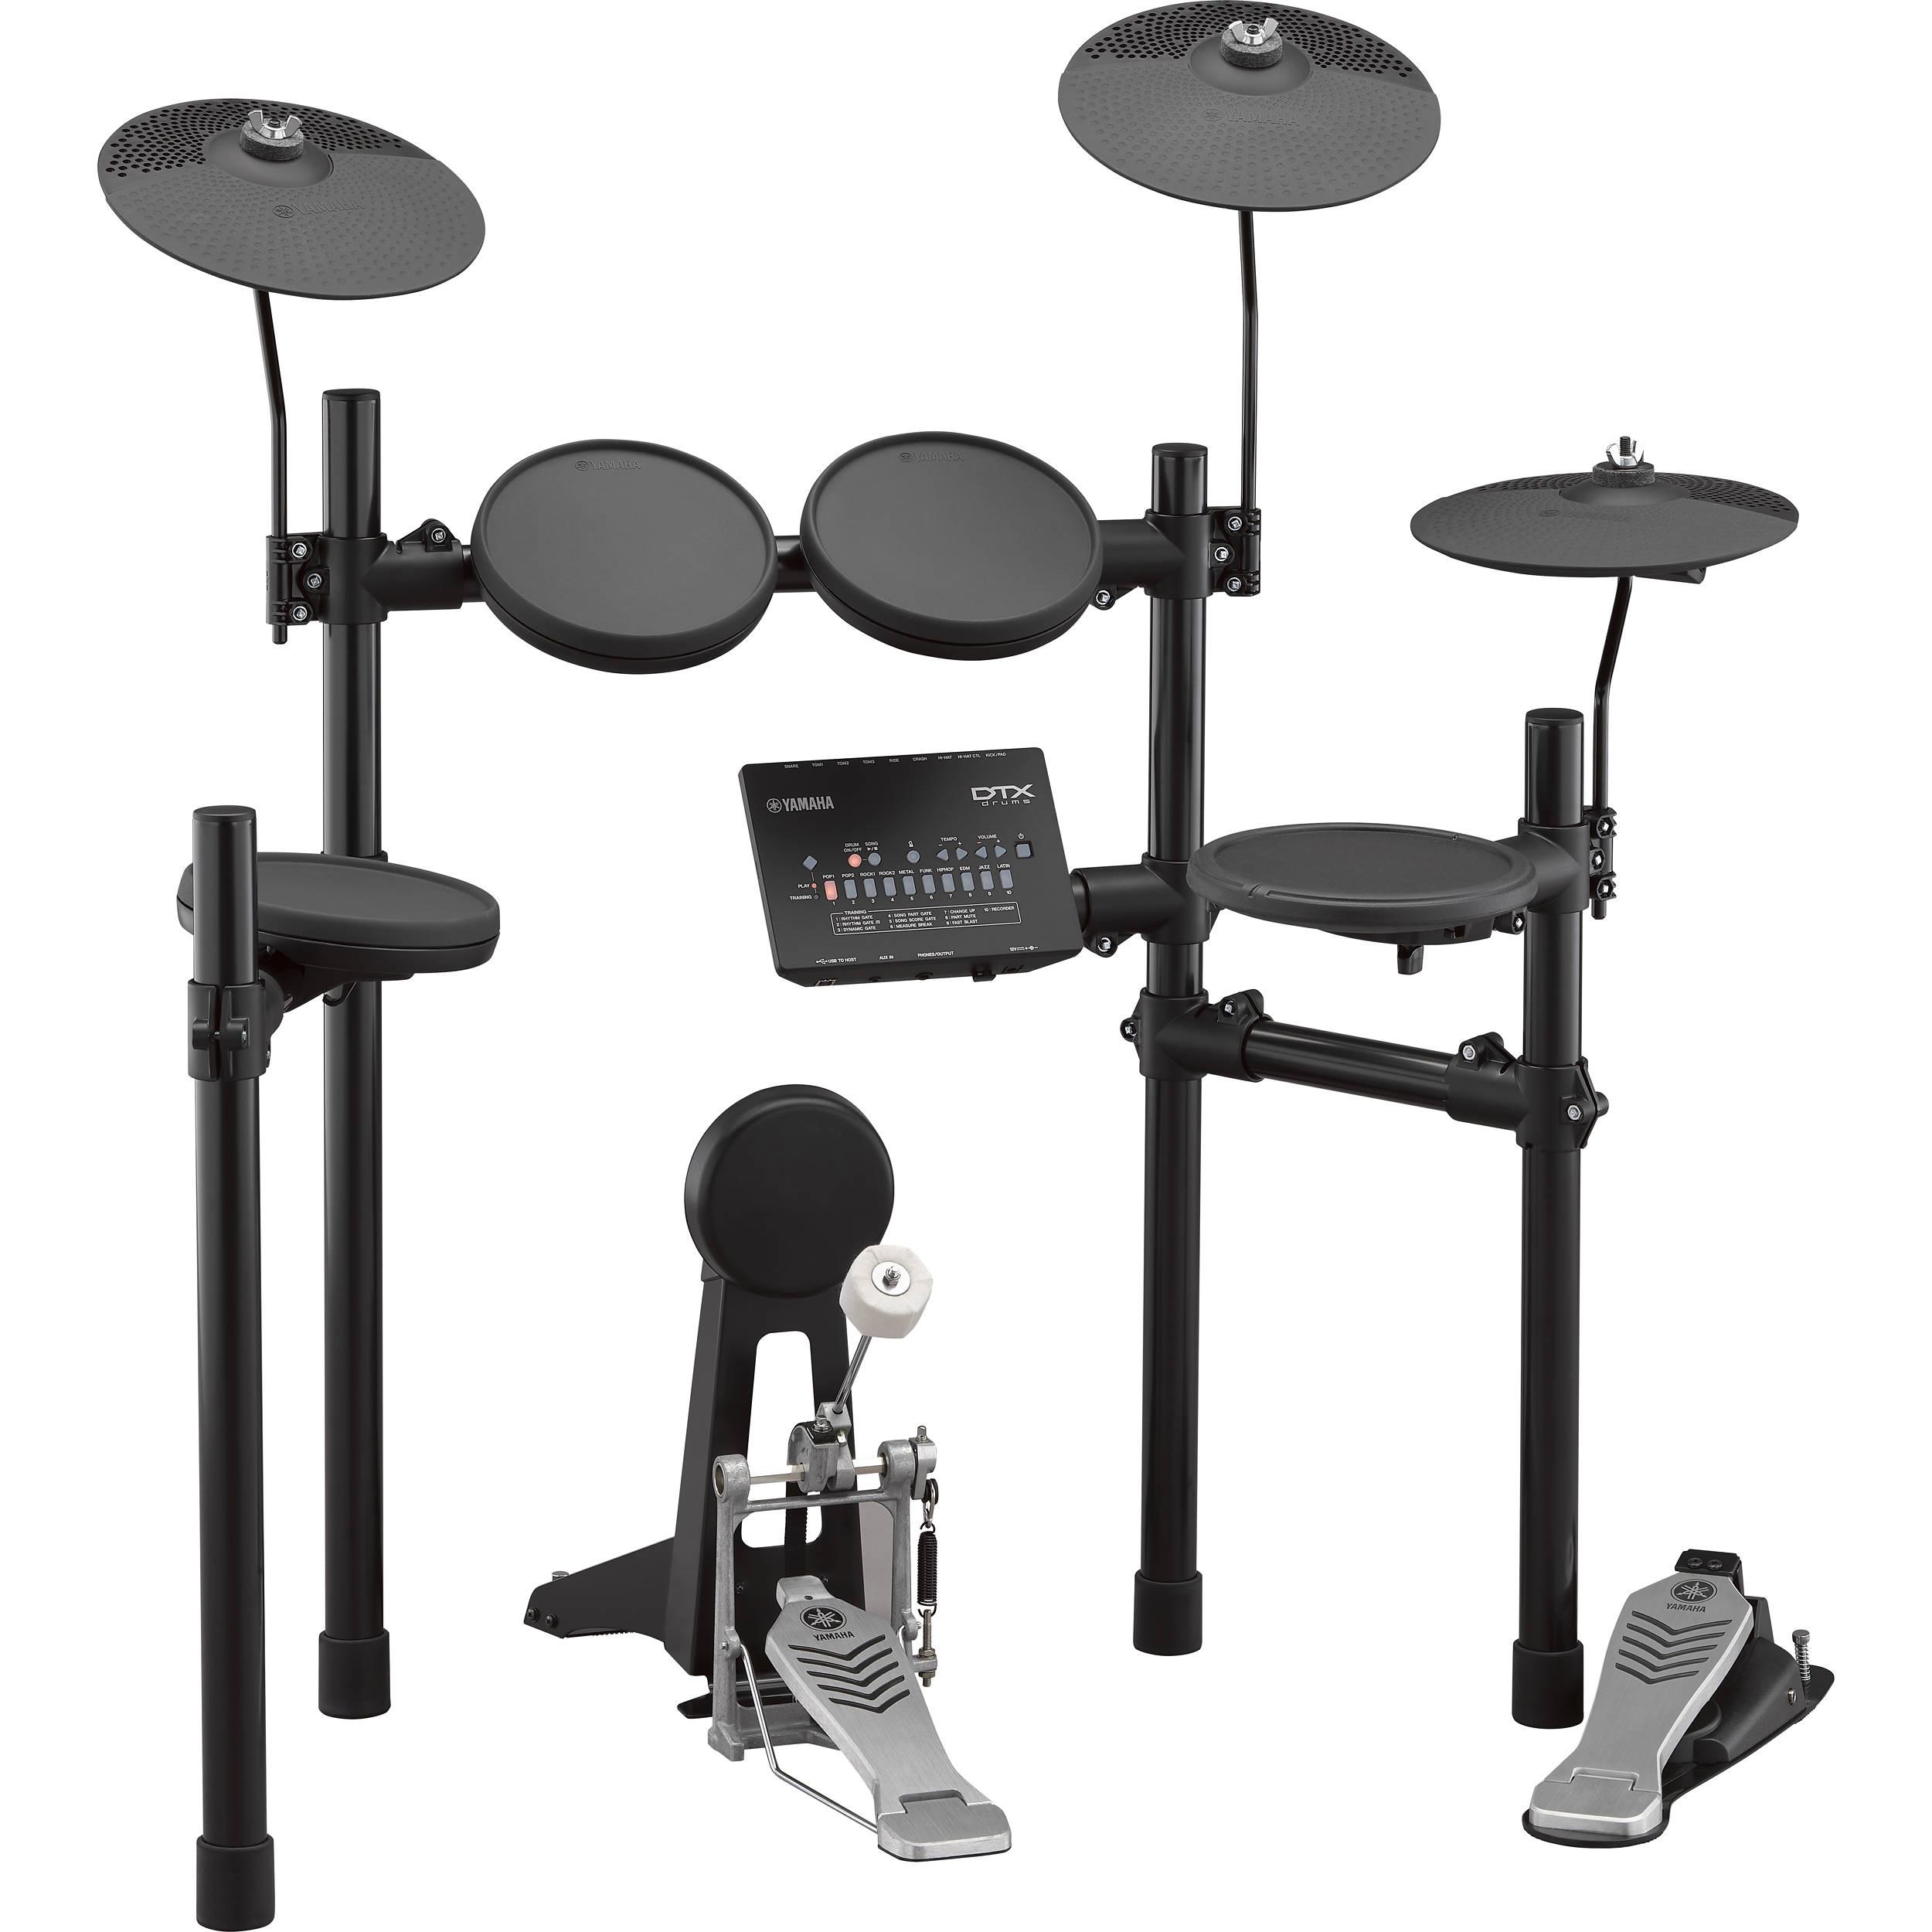 yamaha dtx452k electronic drum kit dtx452k b h photo video. Black Bedroom Furniture Sets. Home Design Ideas